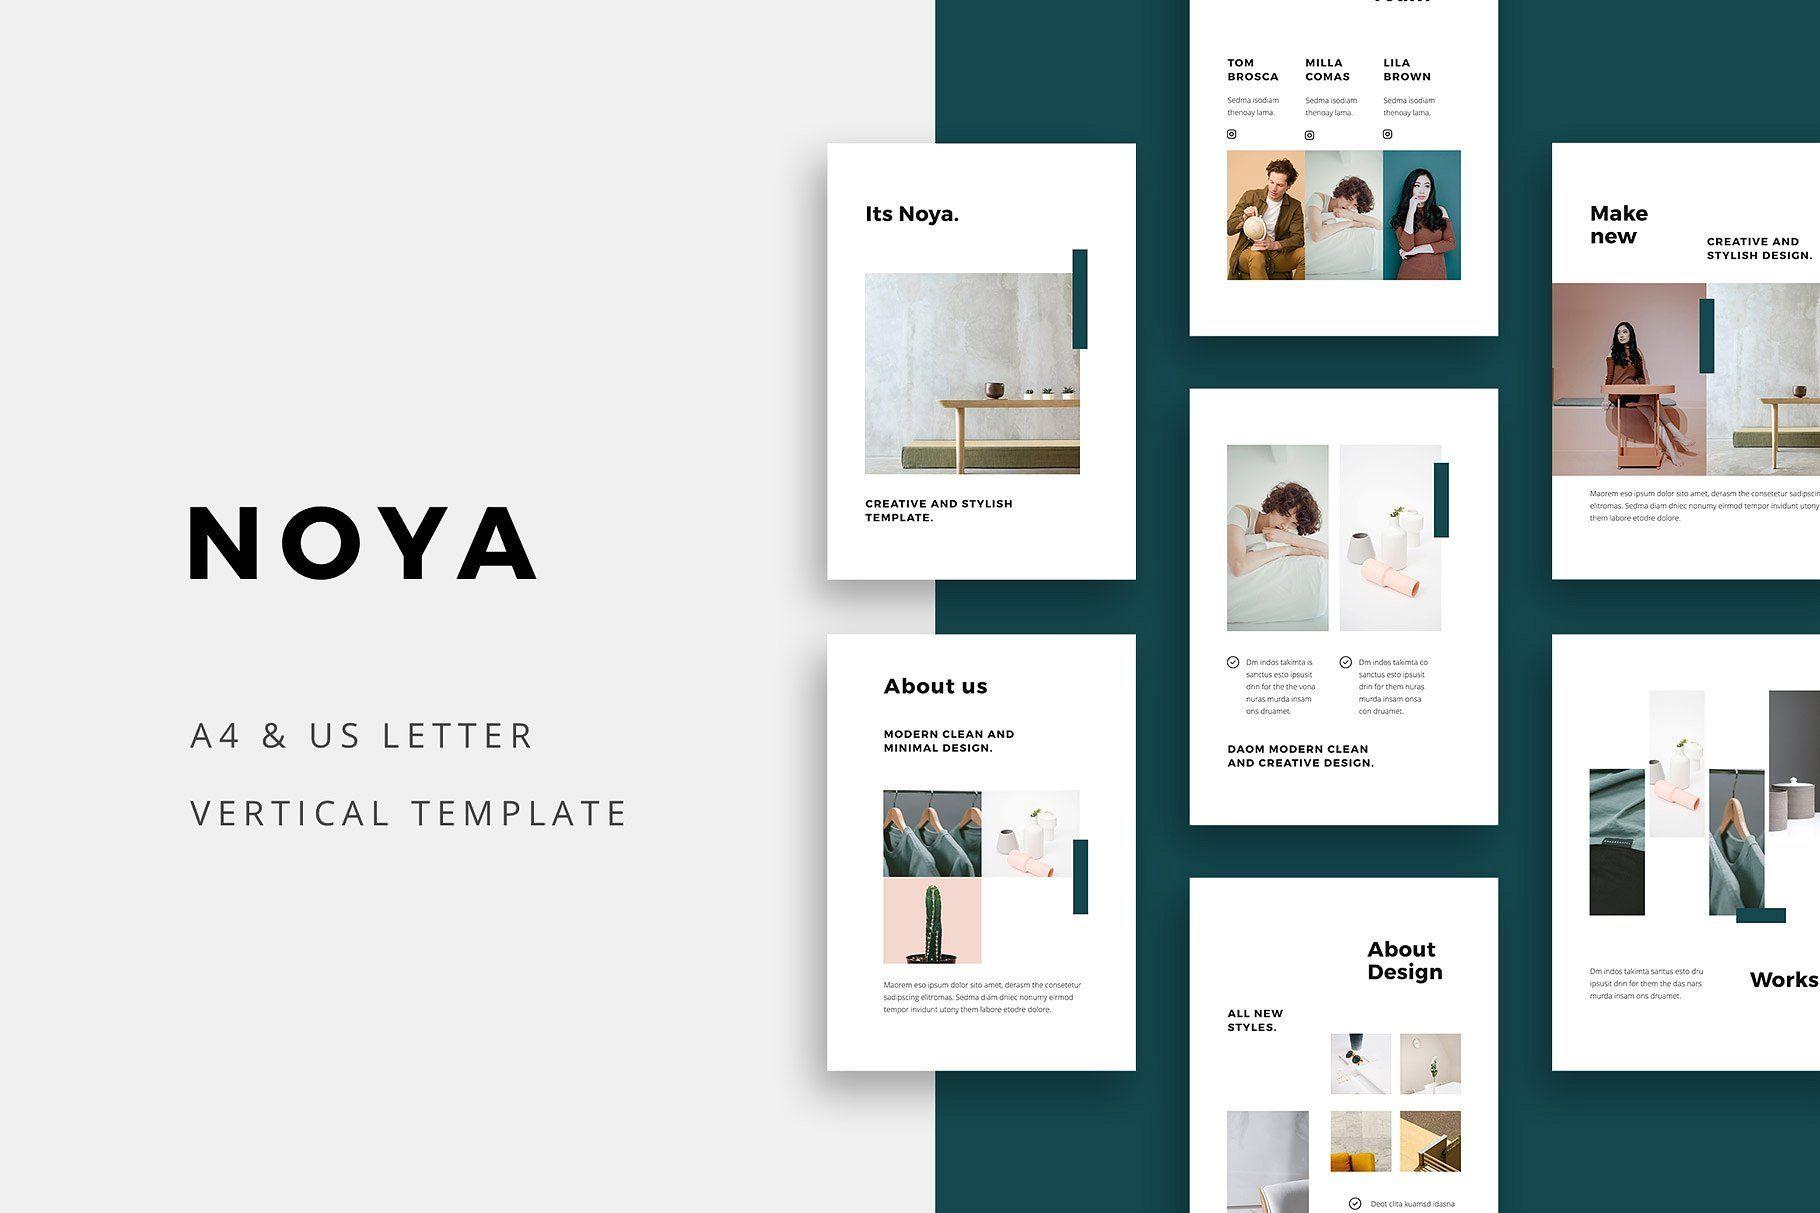 NOYA Vertical Powerpoint Template 템플릿, 사이트 디자인